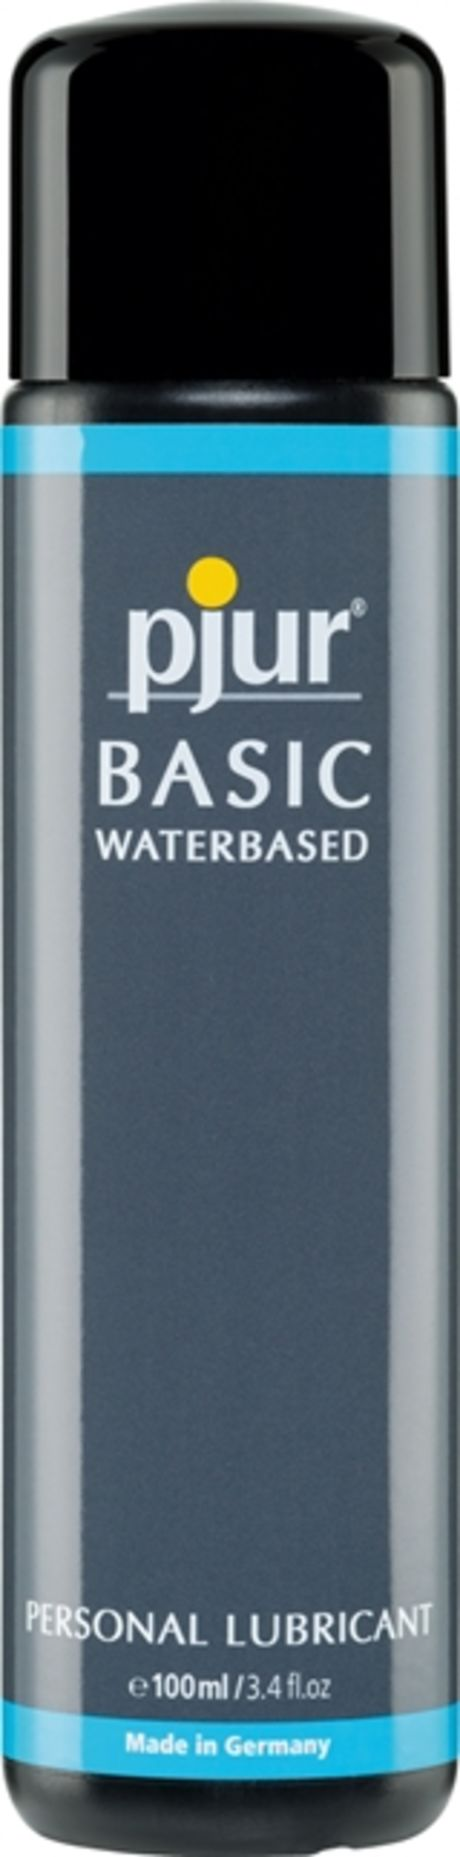 100 ml pjur Basic waterbased - En vandbaseret all-round glidecreme!